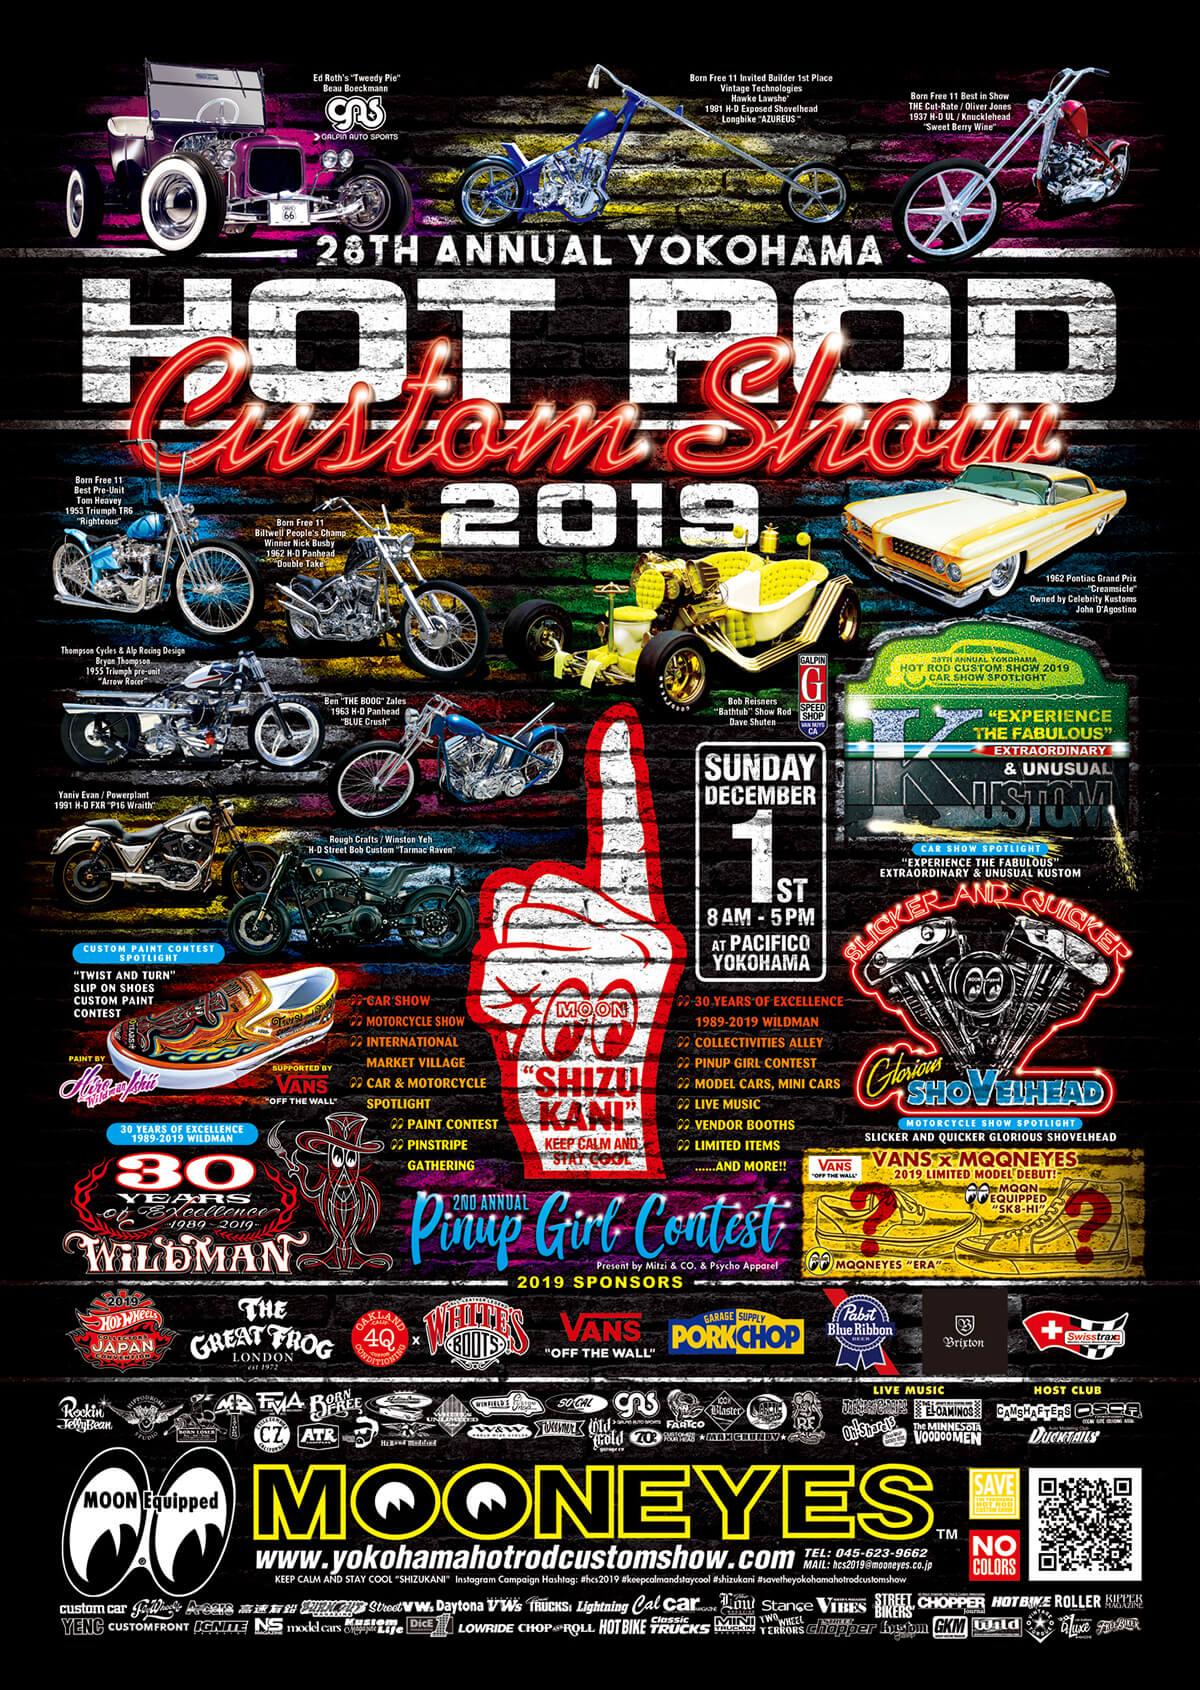 28th Annual YOKOHAMA HOT ROD CUSTOM SHOW 2019 Final Poster